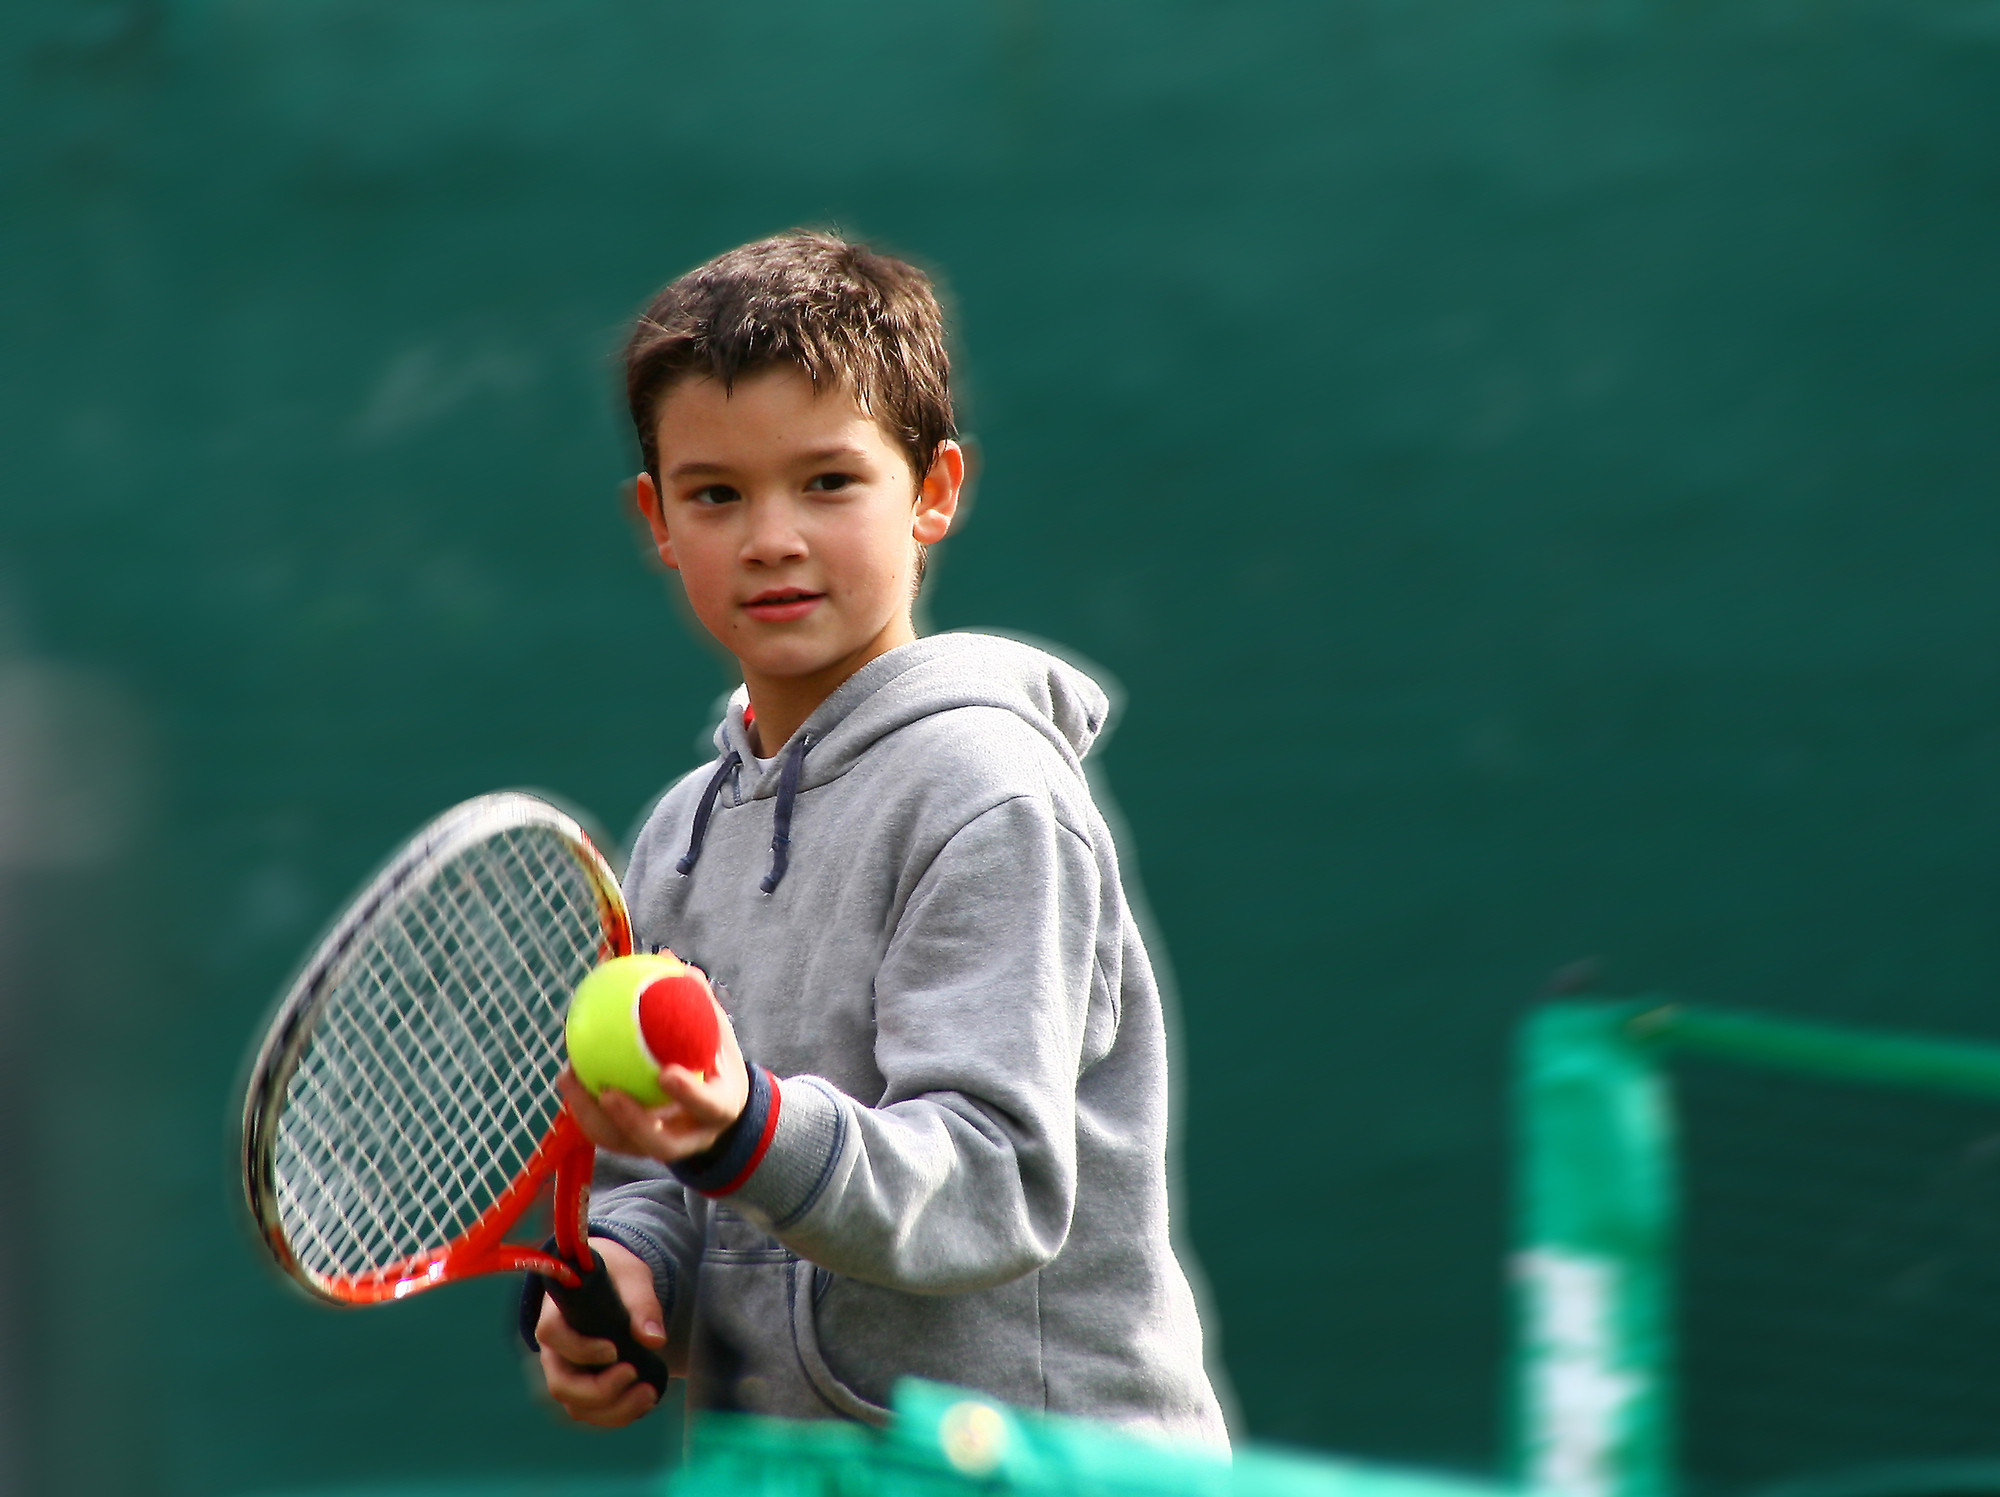 U8 Tennis Lessons - Session 1